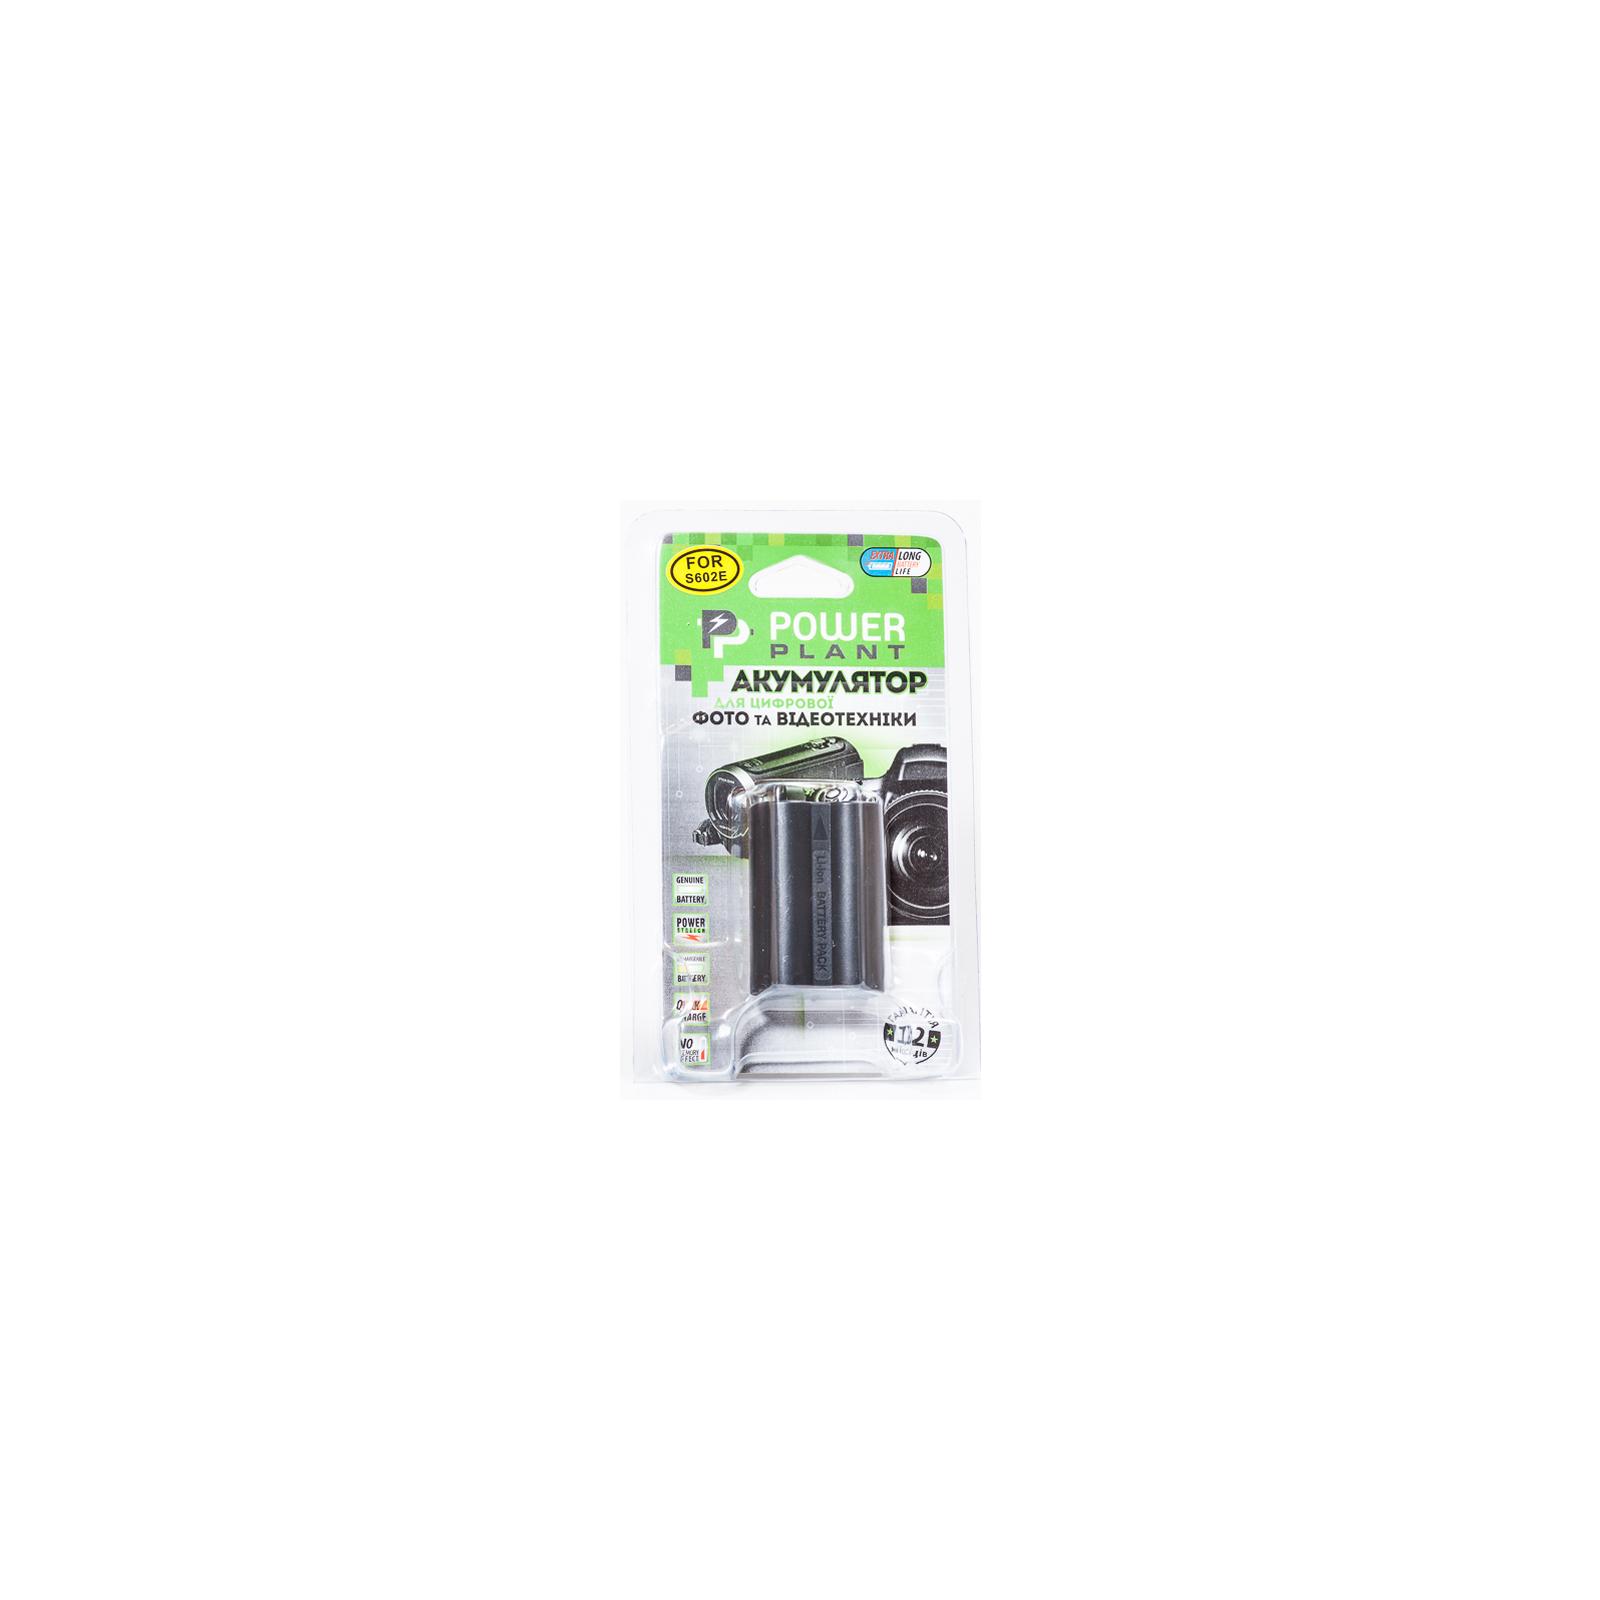 Аккумулятор к фото/видео PowerPlant Panasonic DMW-BL14, CGR-S602E, BP-DC1, BP-DC3 (DV00DV1338) изображение 3